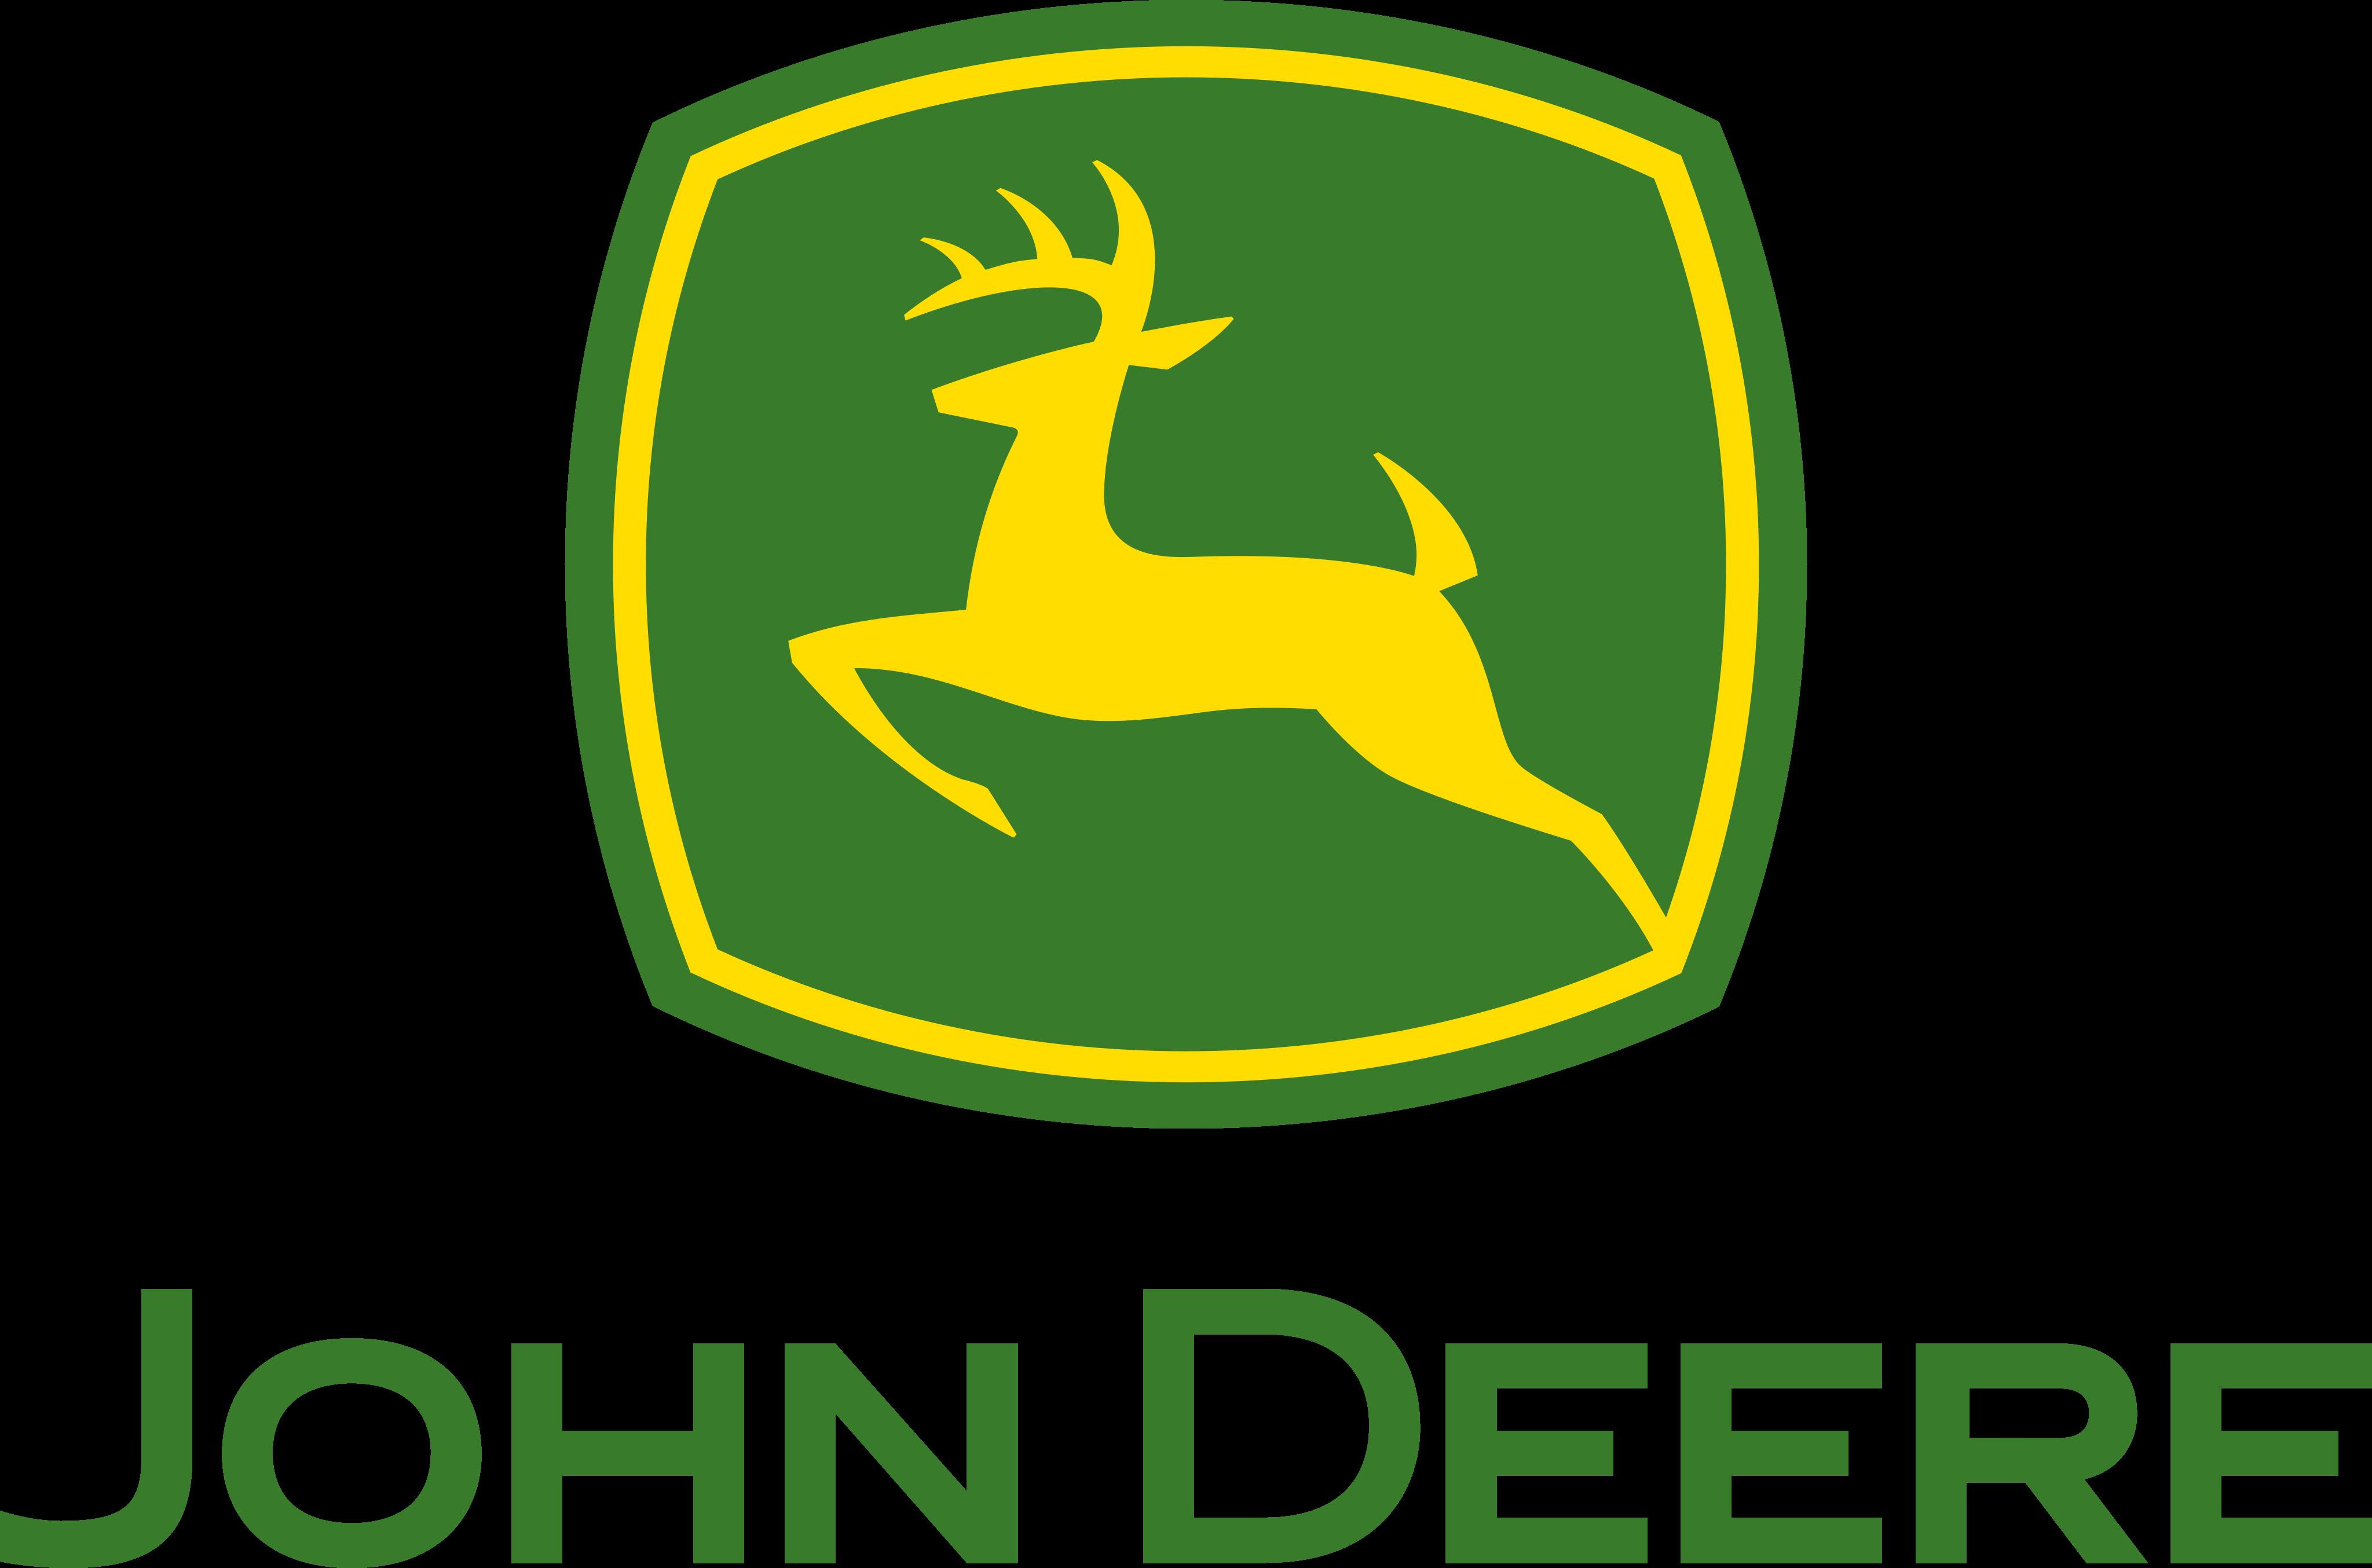 john deere logo 01 - John Deere Logo